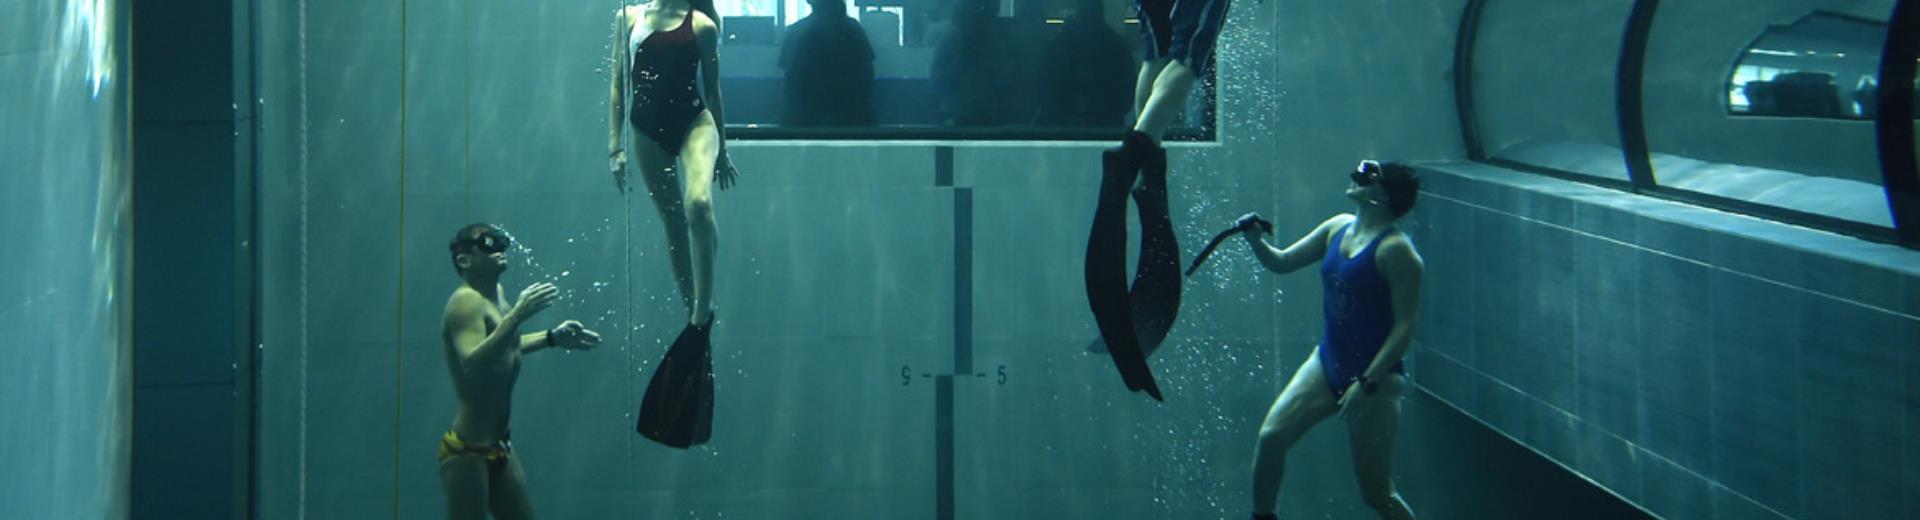 Padova y 40 la piscina pi profonda al mondo bw plus for Piscina y 40 padova